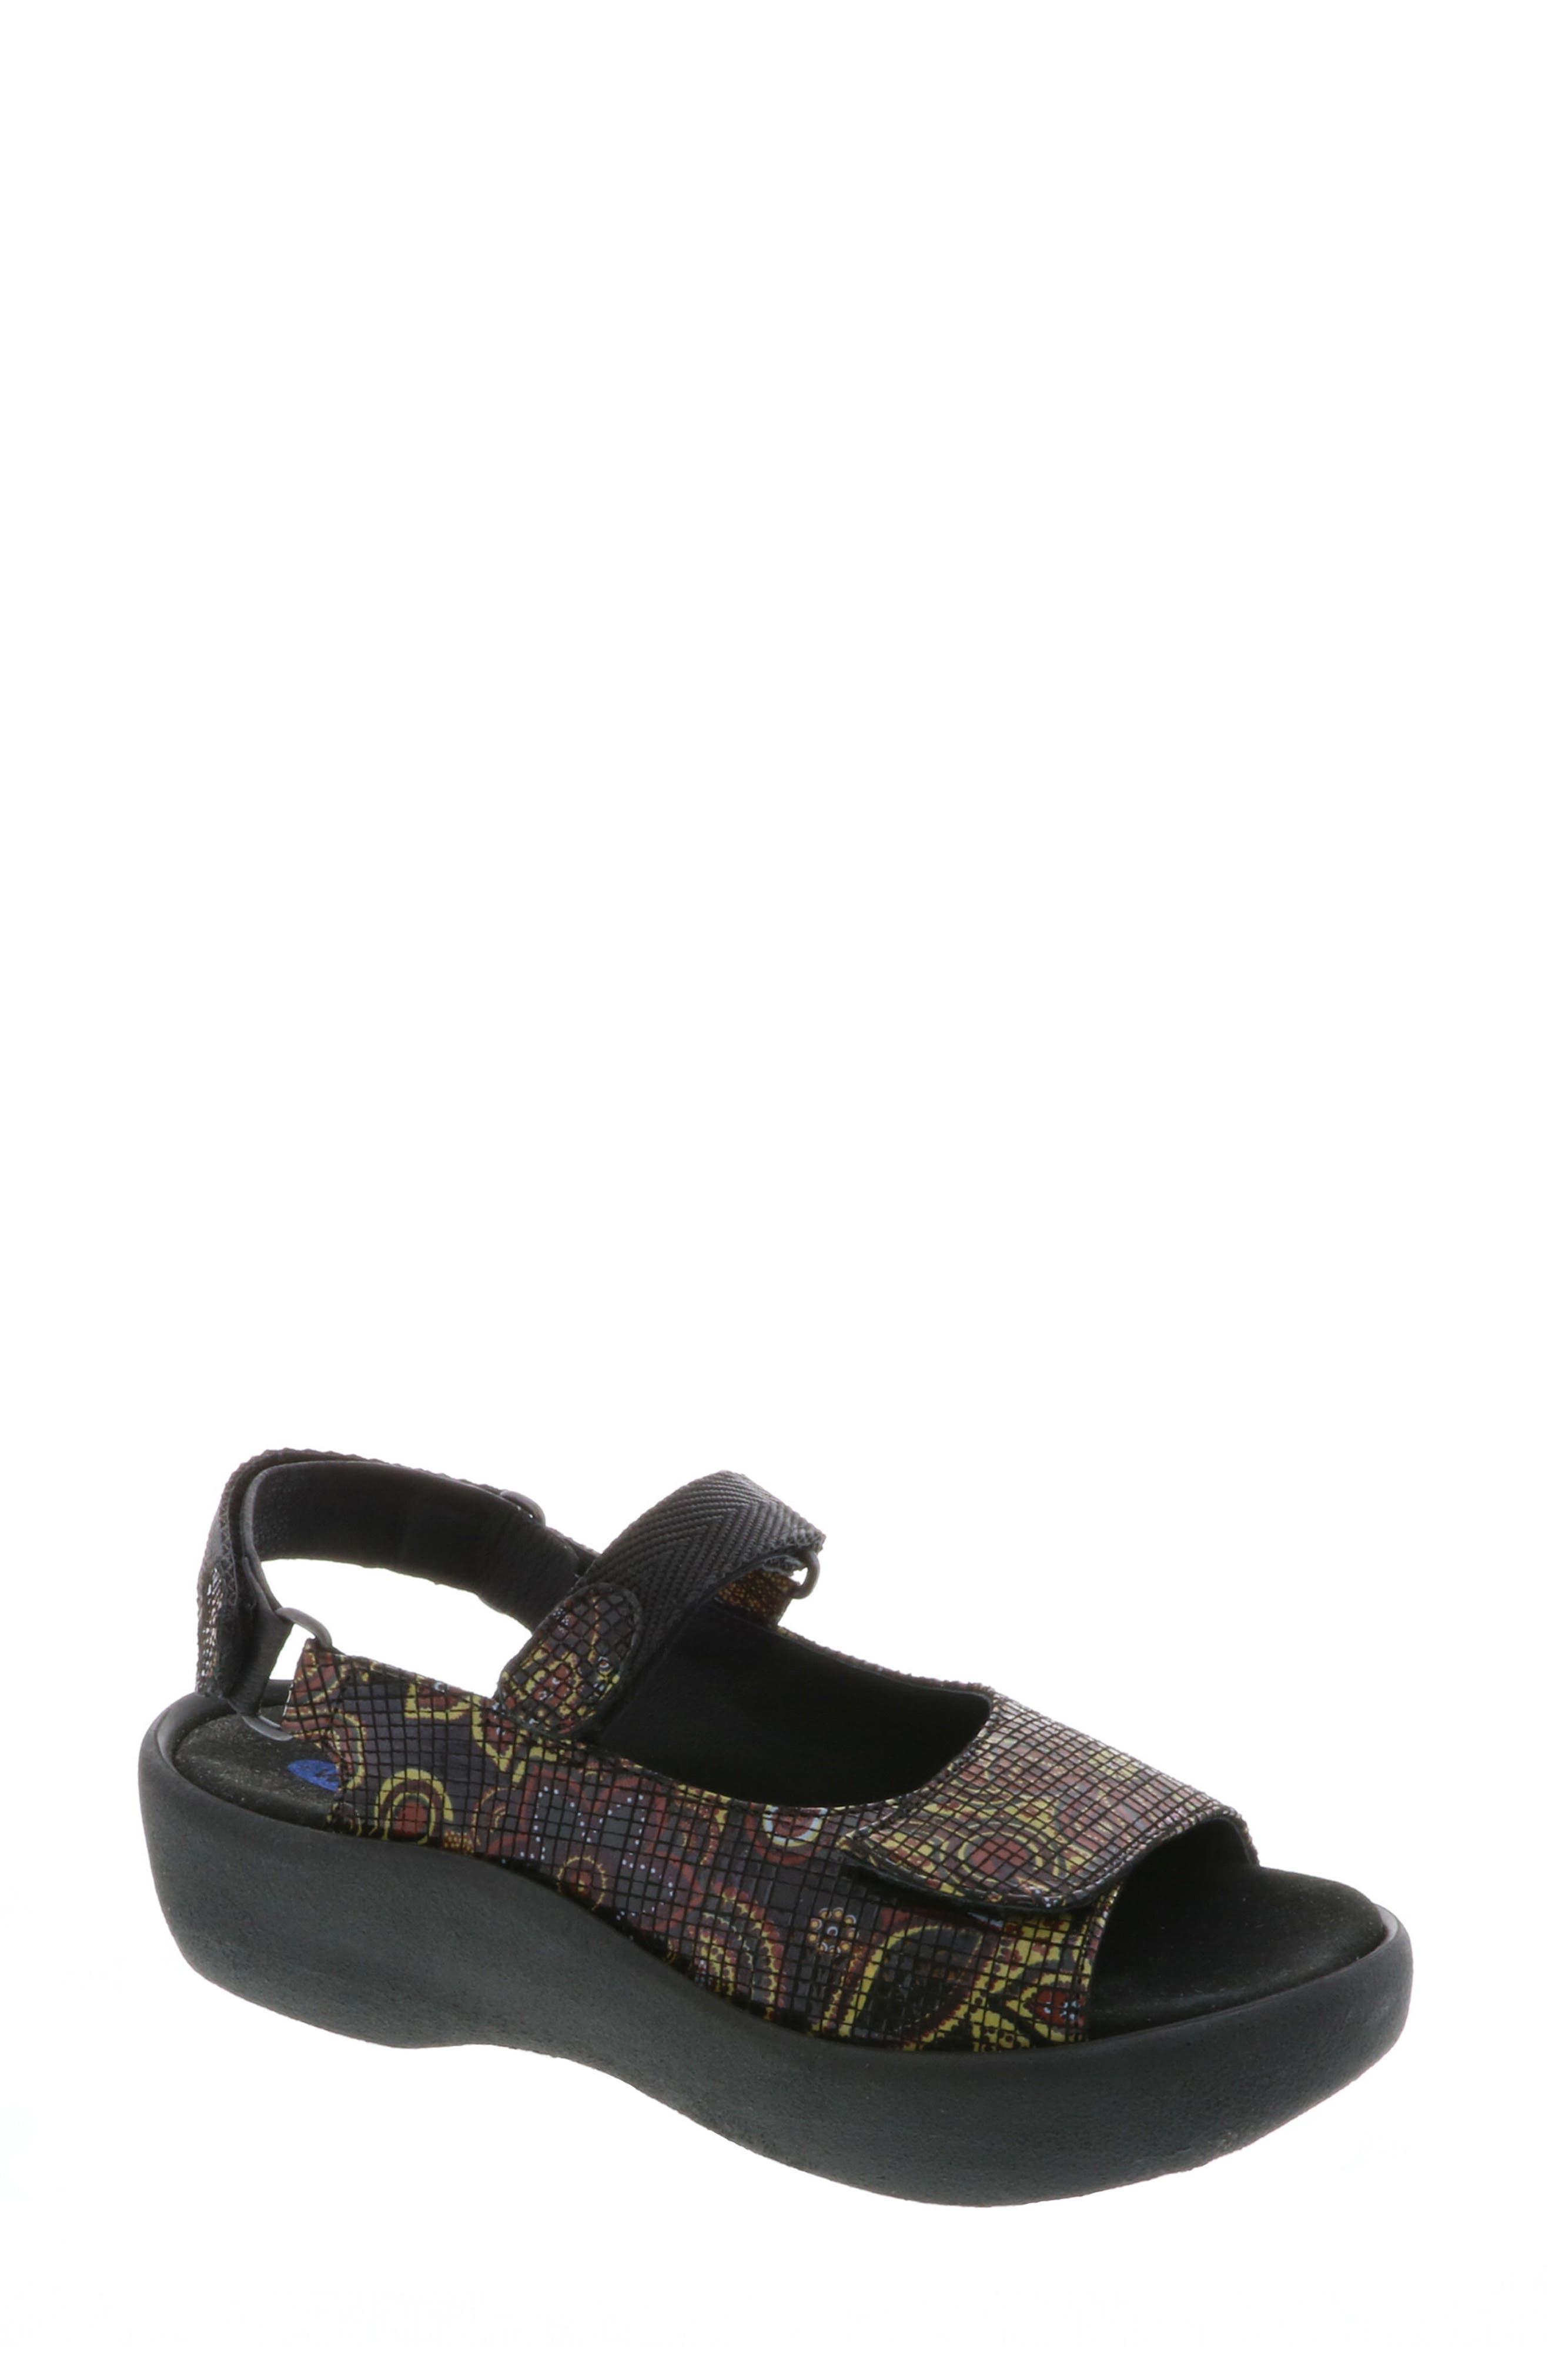 Jewel Sport Sandal,                         Main,                         color, Black Flower Print